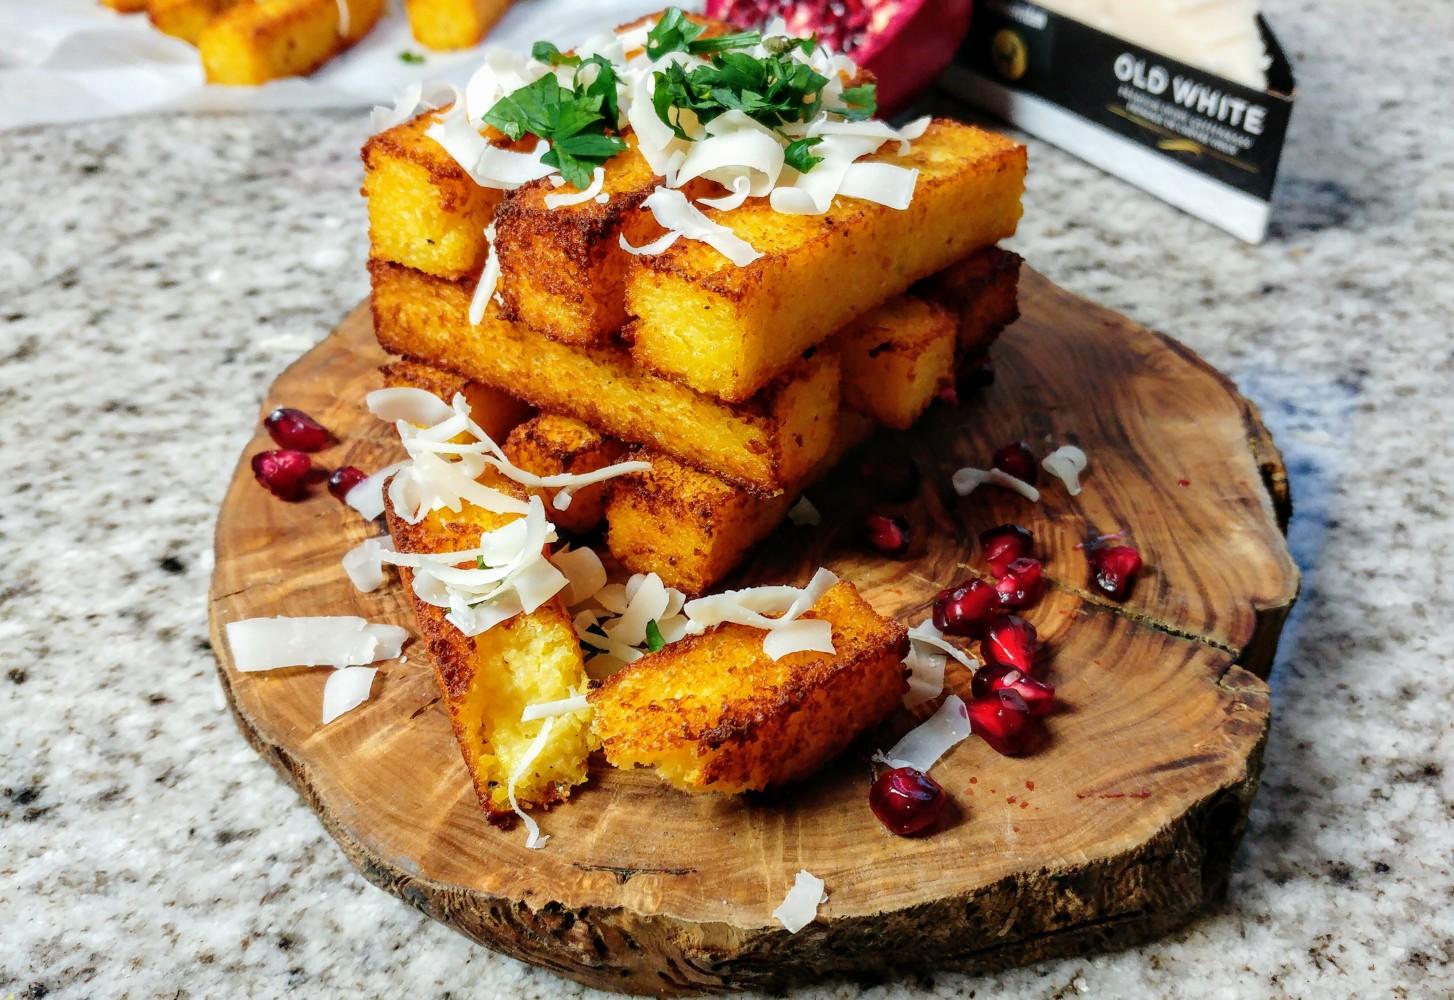 Polenta frieten met Old White geitenkaas en yoghurt-granaatappelpit saus